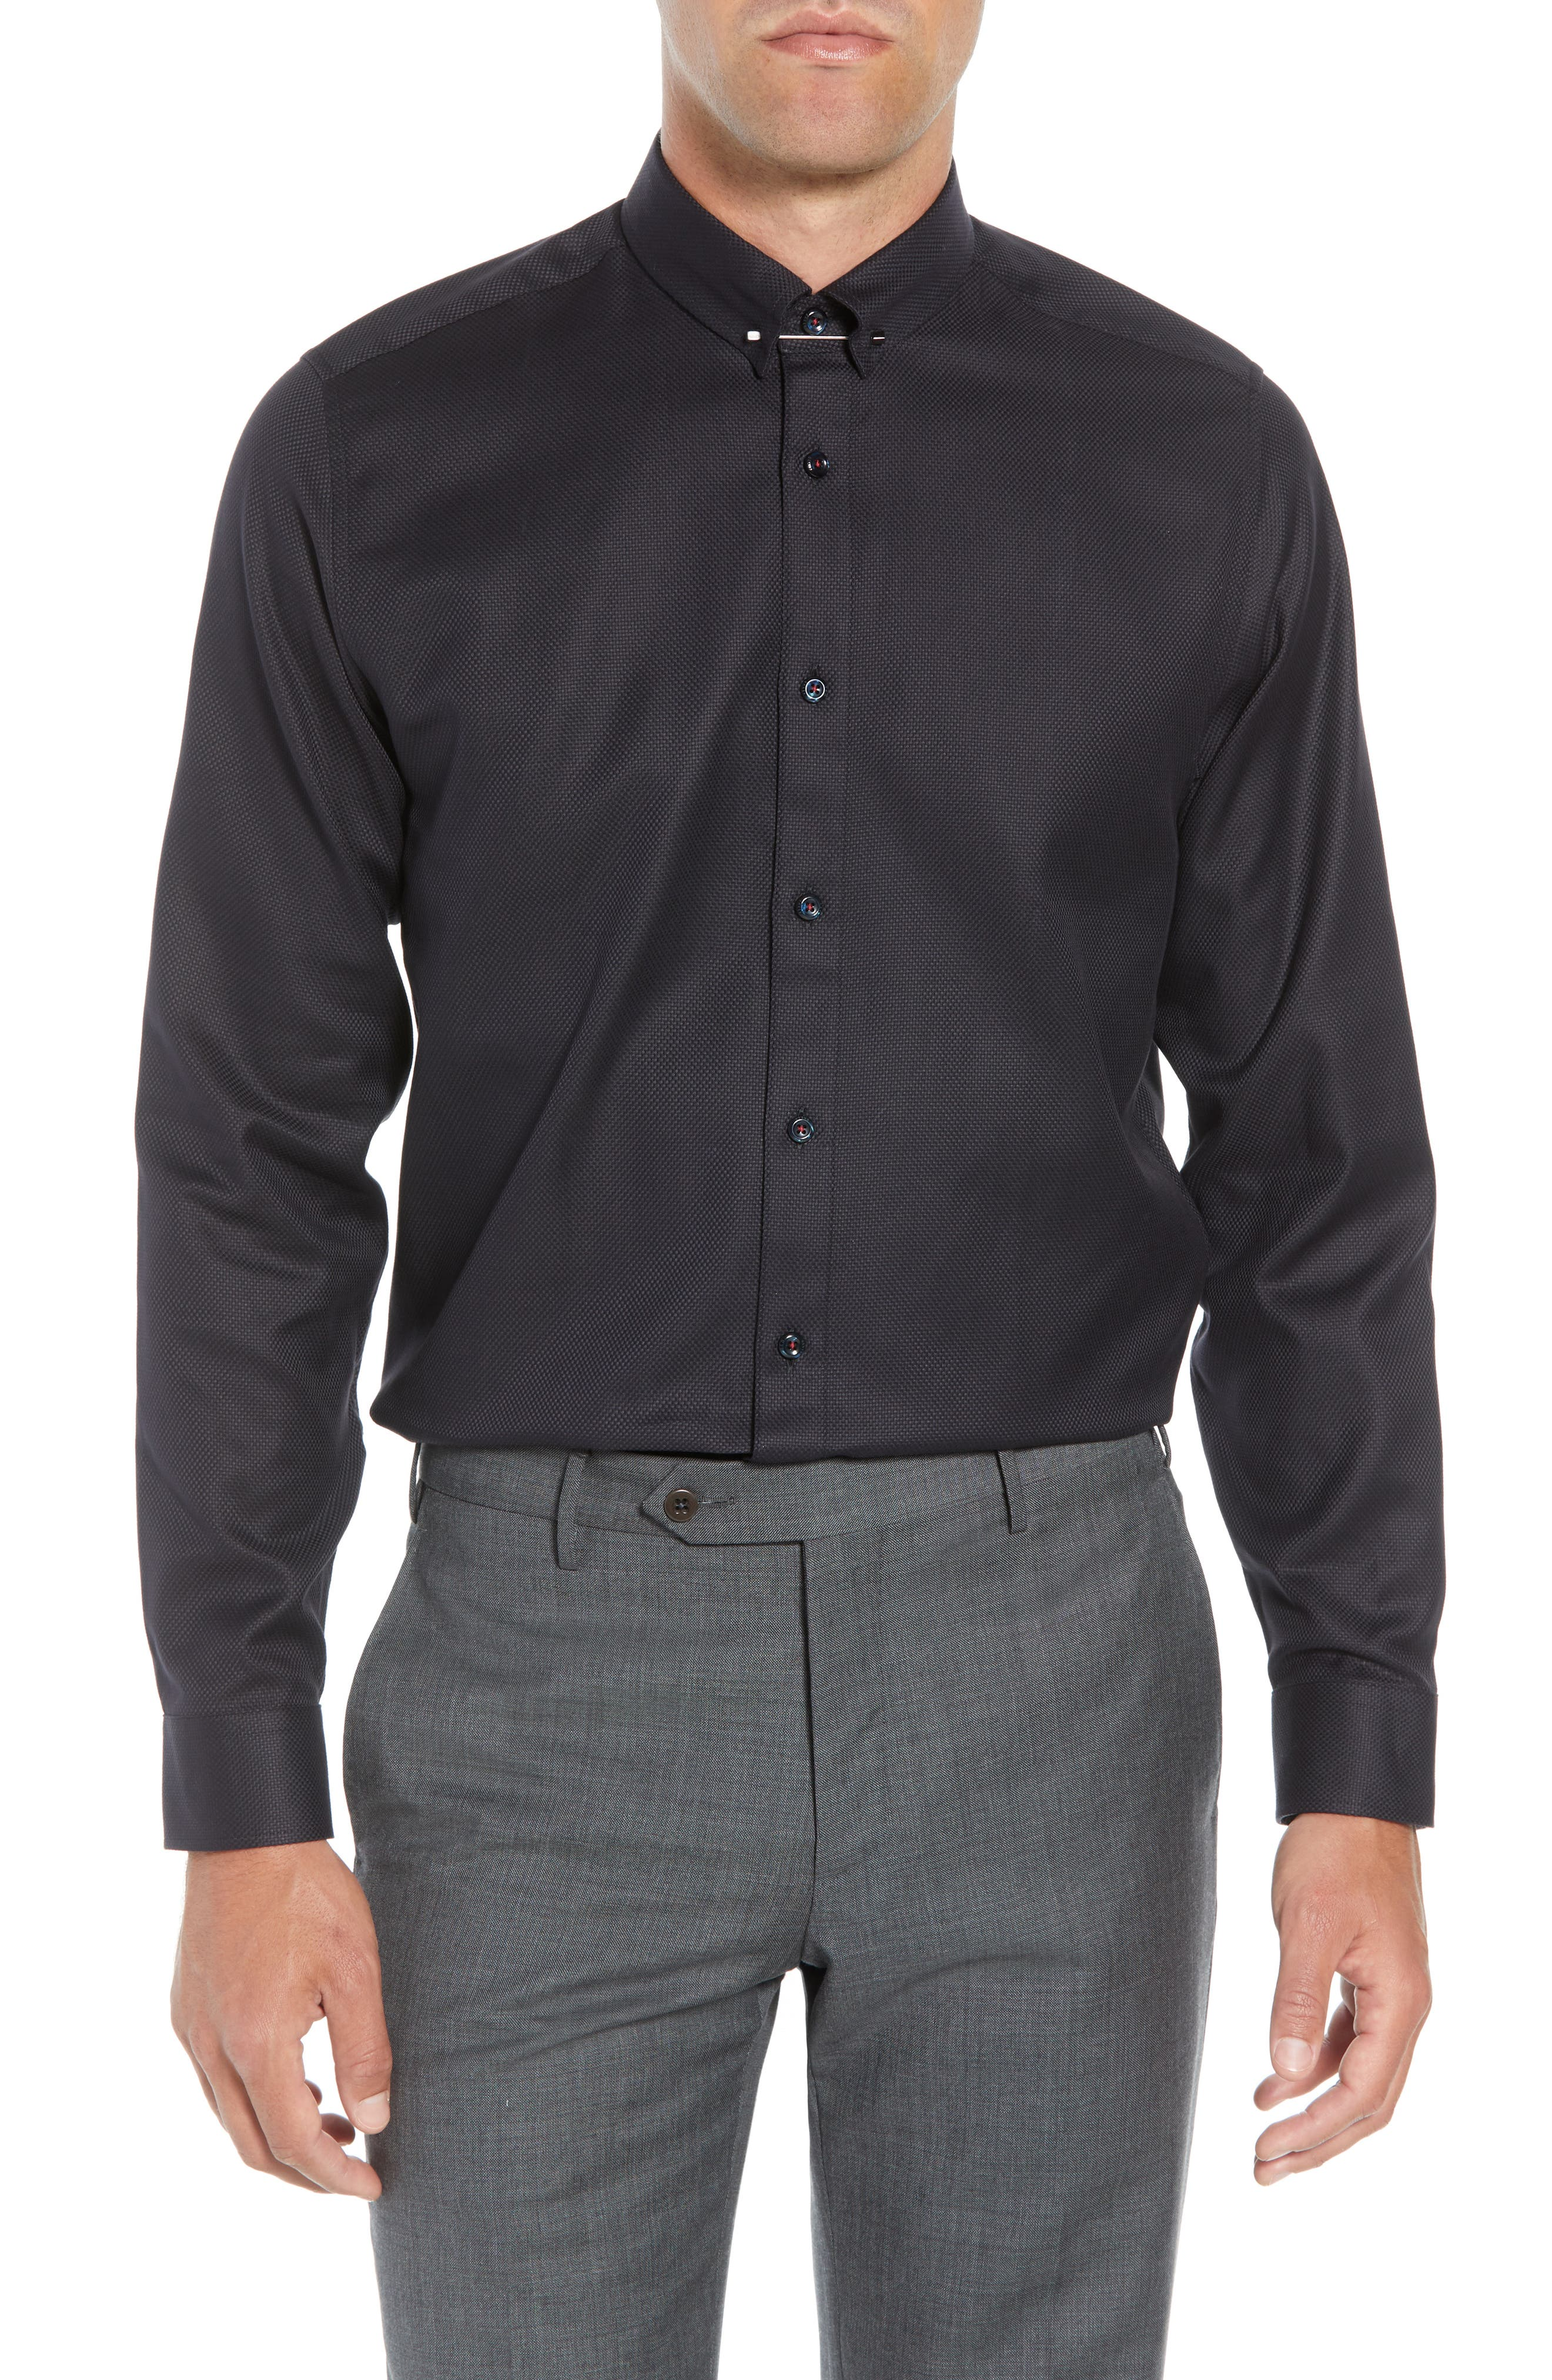 Leek Slim Fit Solid Dress Shirt,                         Main,                         color, NAVY